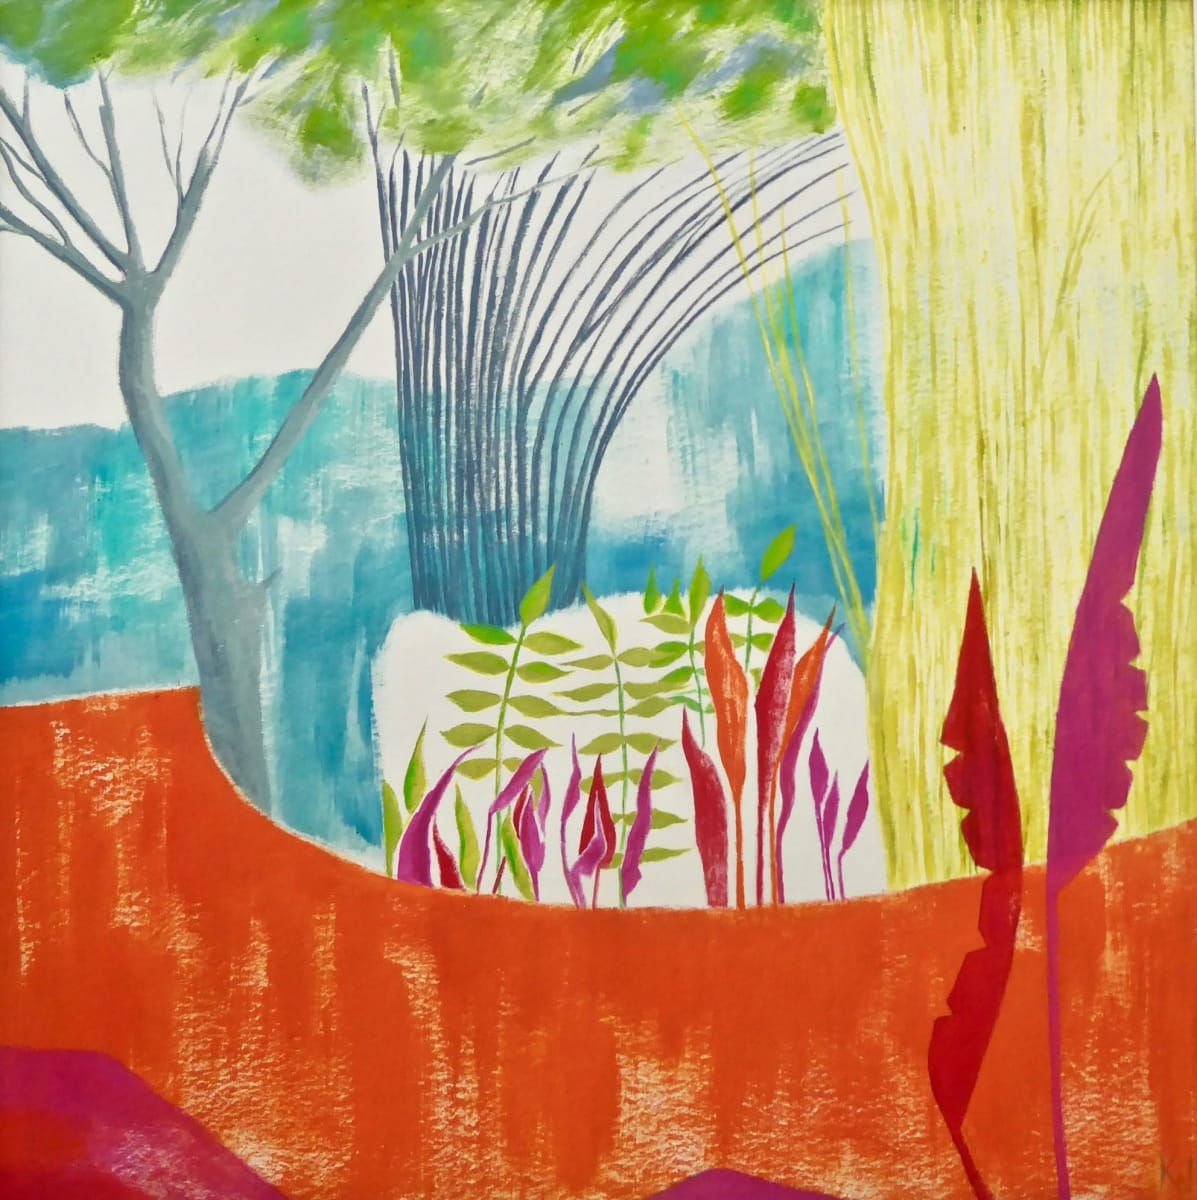 WHI020, Garden Glimpse 2 by Katie Whitbread